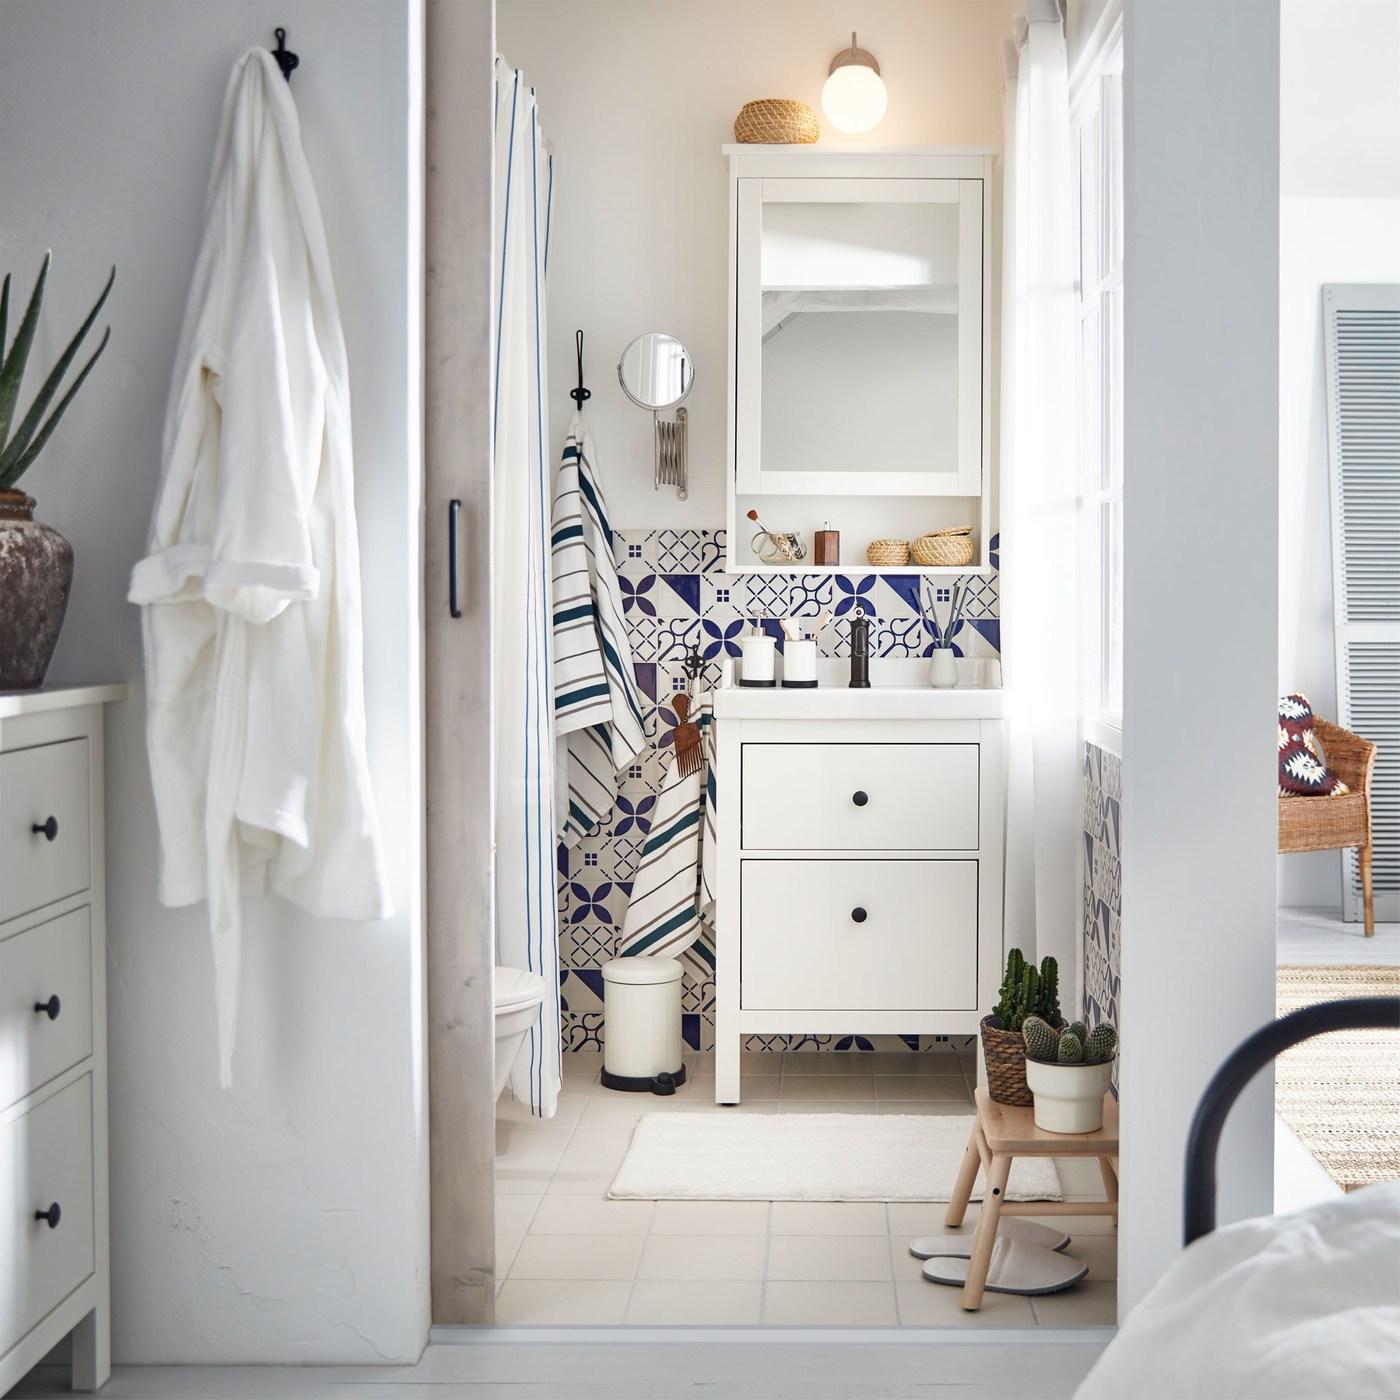 Mensole Ikea Cucina Prezzi furnishing ideas & inspiration for your bathroom - ikea